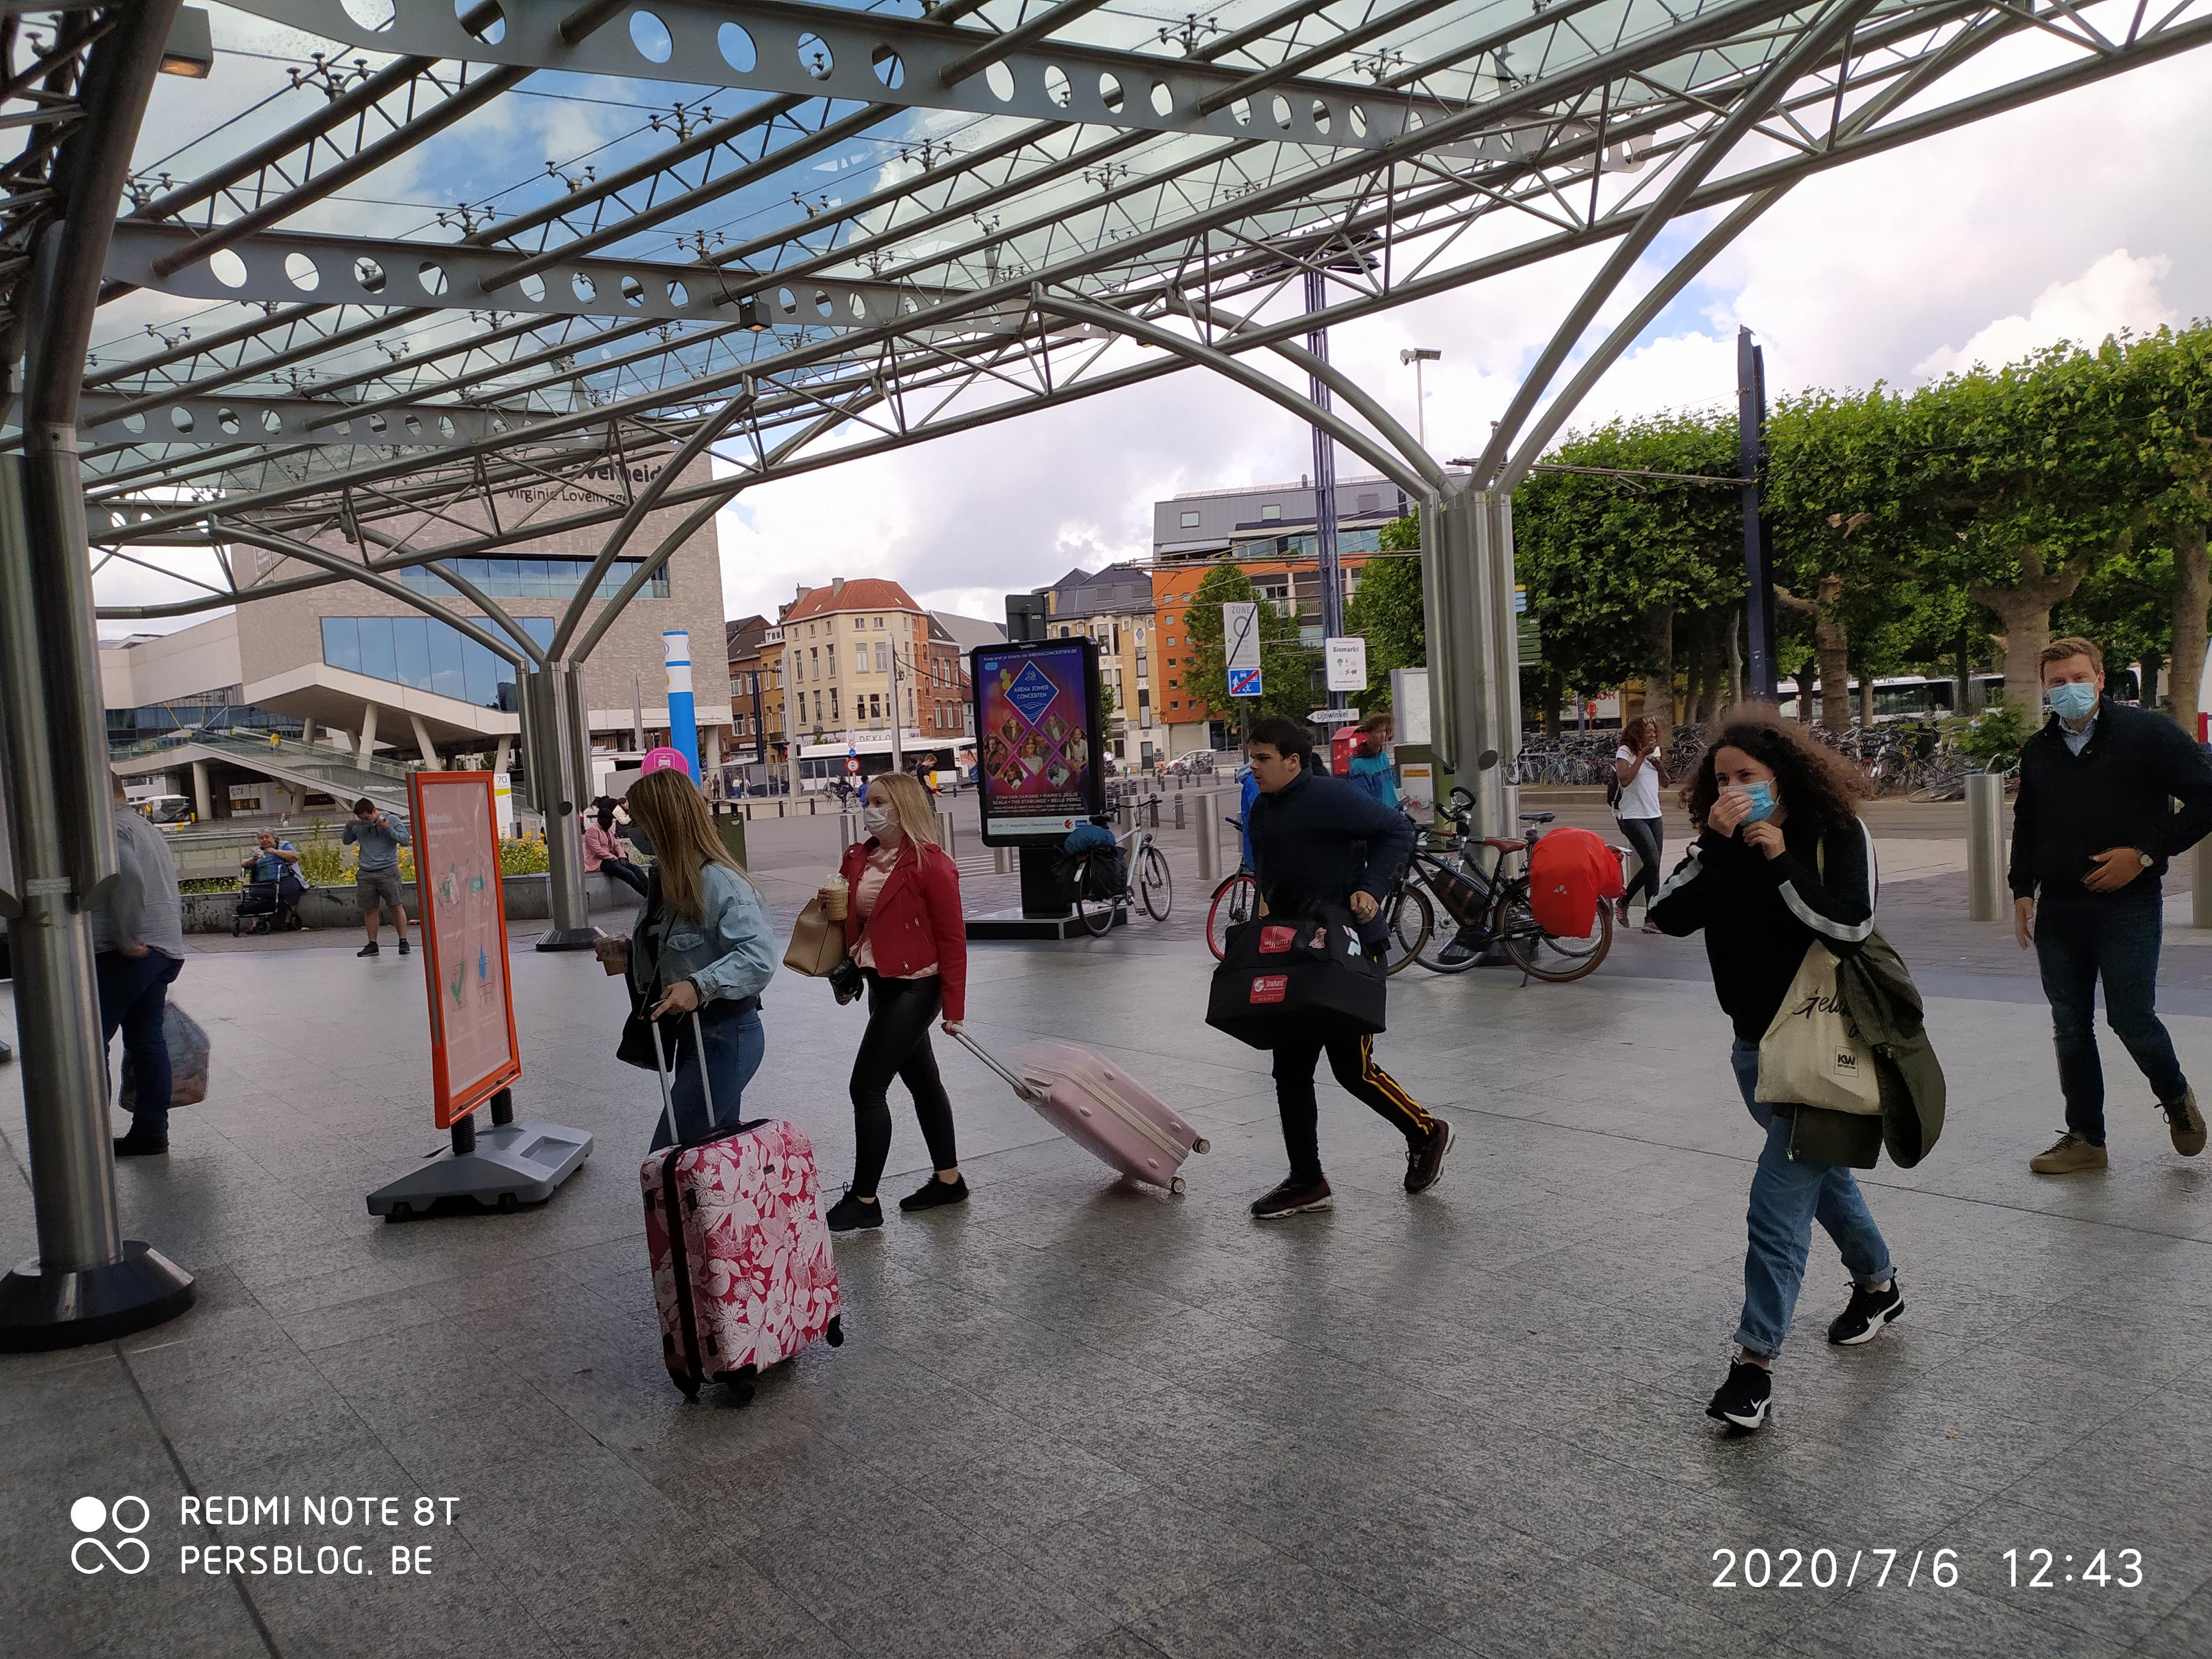 Koningin Maria Hendrikaplein - Station - Gent-Sint-Pieters op maandag 6 juli 2020 (13)